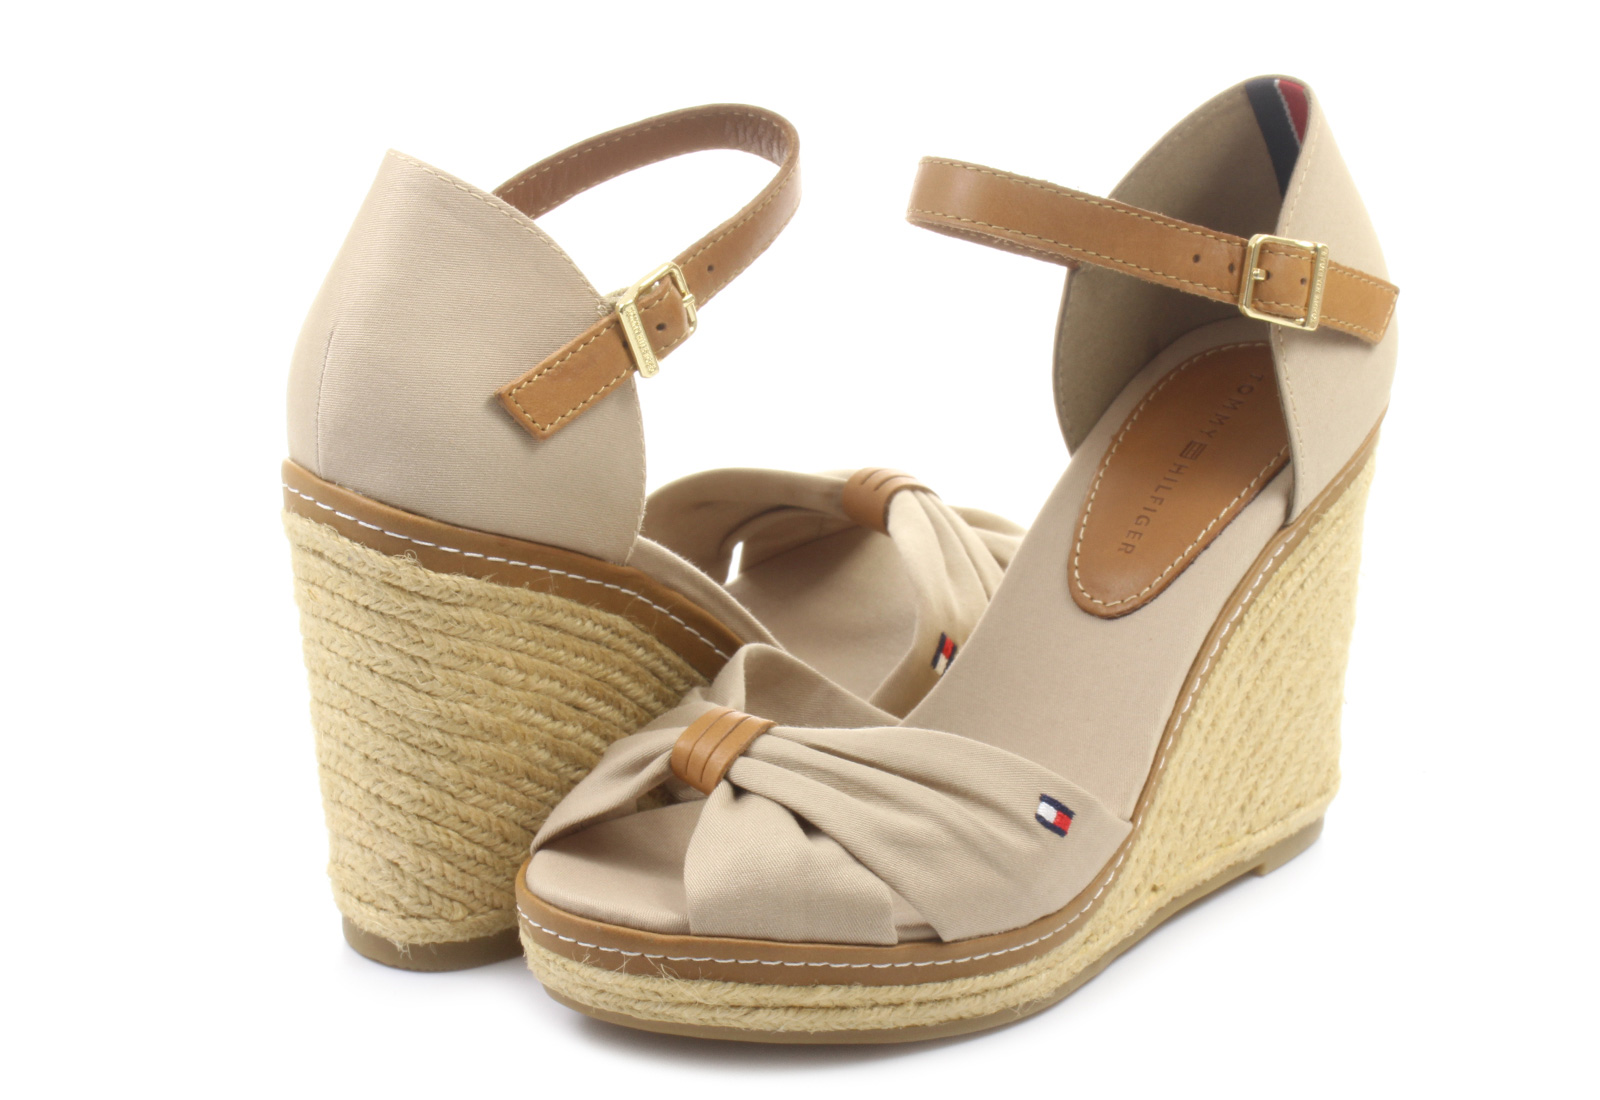 6209d2dc6220 Tommy Hilfiger Sandals - Emery 54d - 15S-8540-938 - Online shop for ...